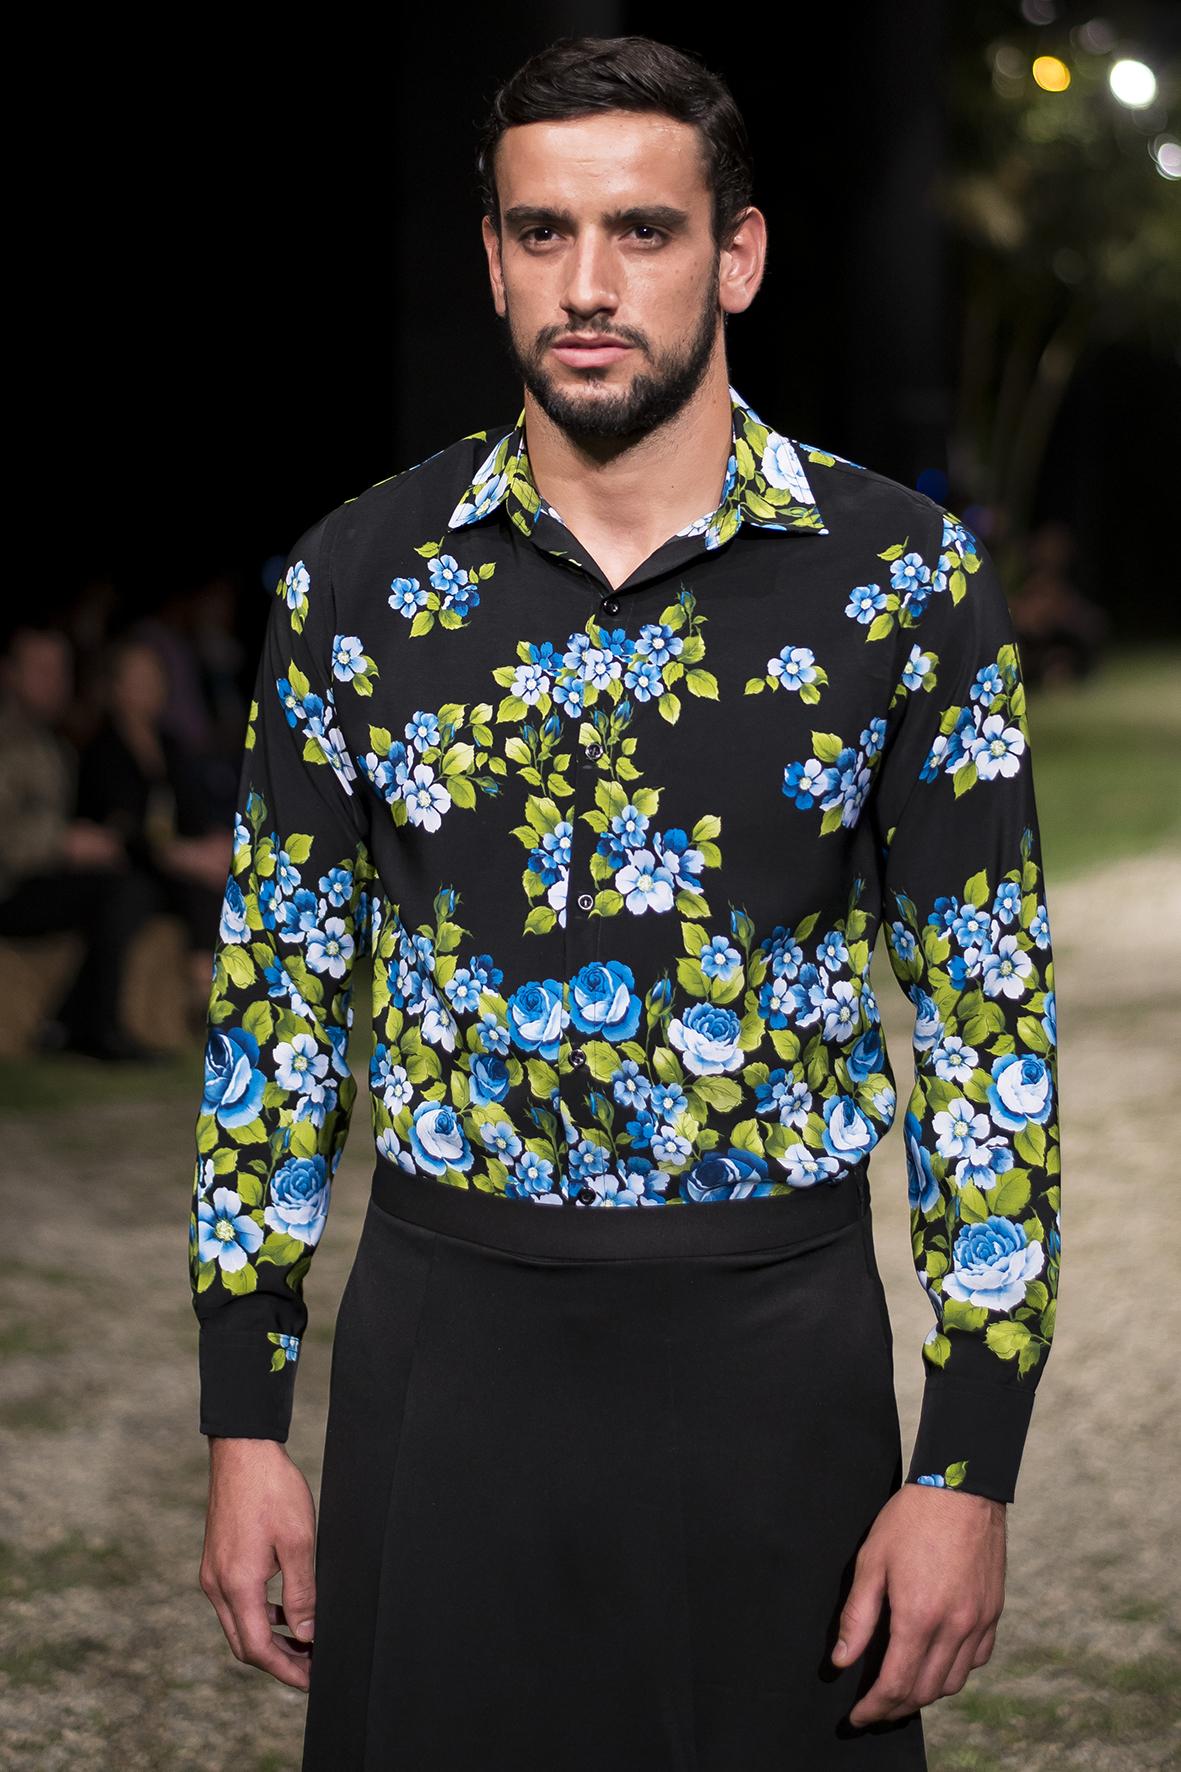 It Project evolet den tavara ceam enrique canales delrieu carolina tola eriko peru fashion moda peruana -  14.JPG